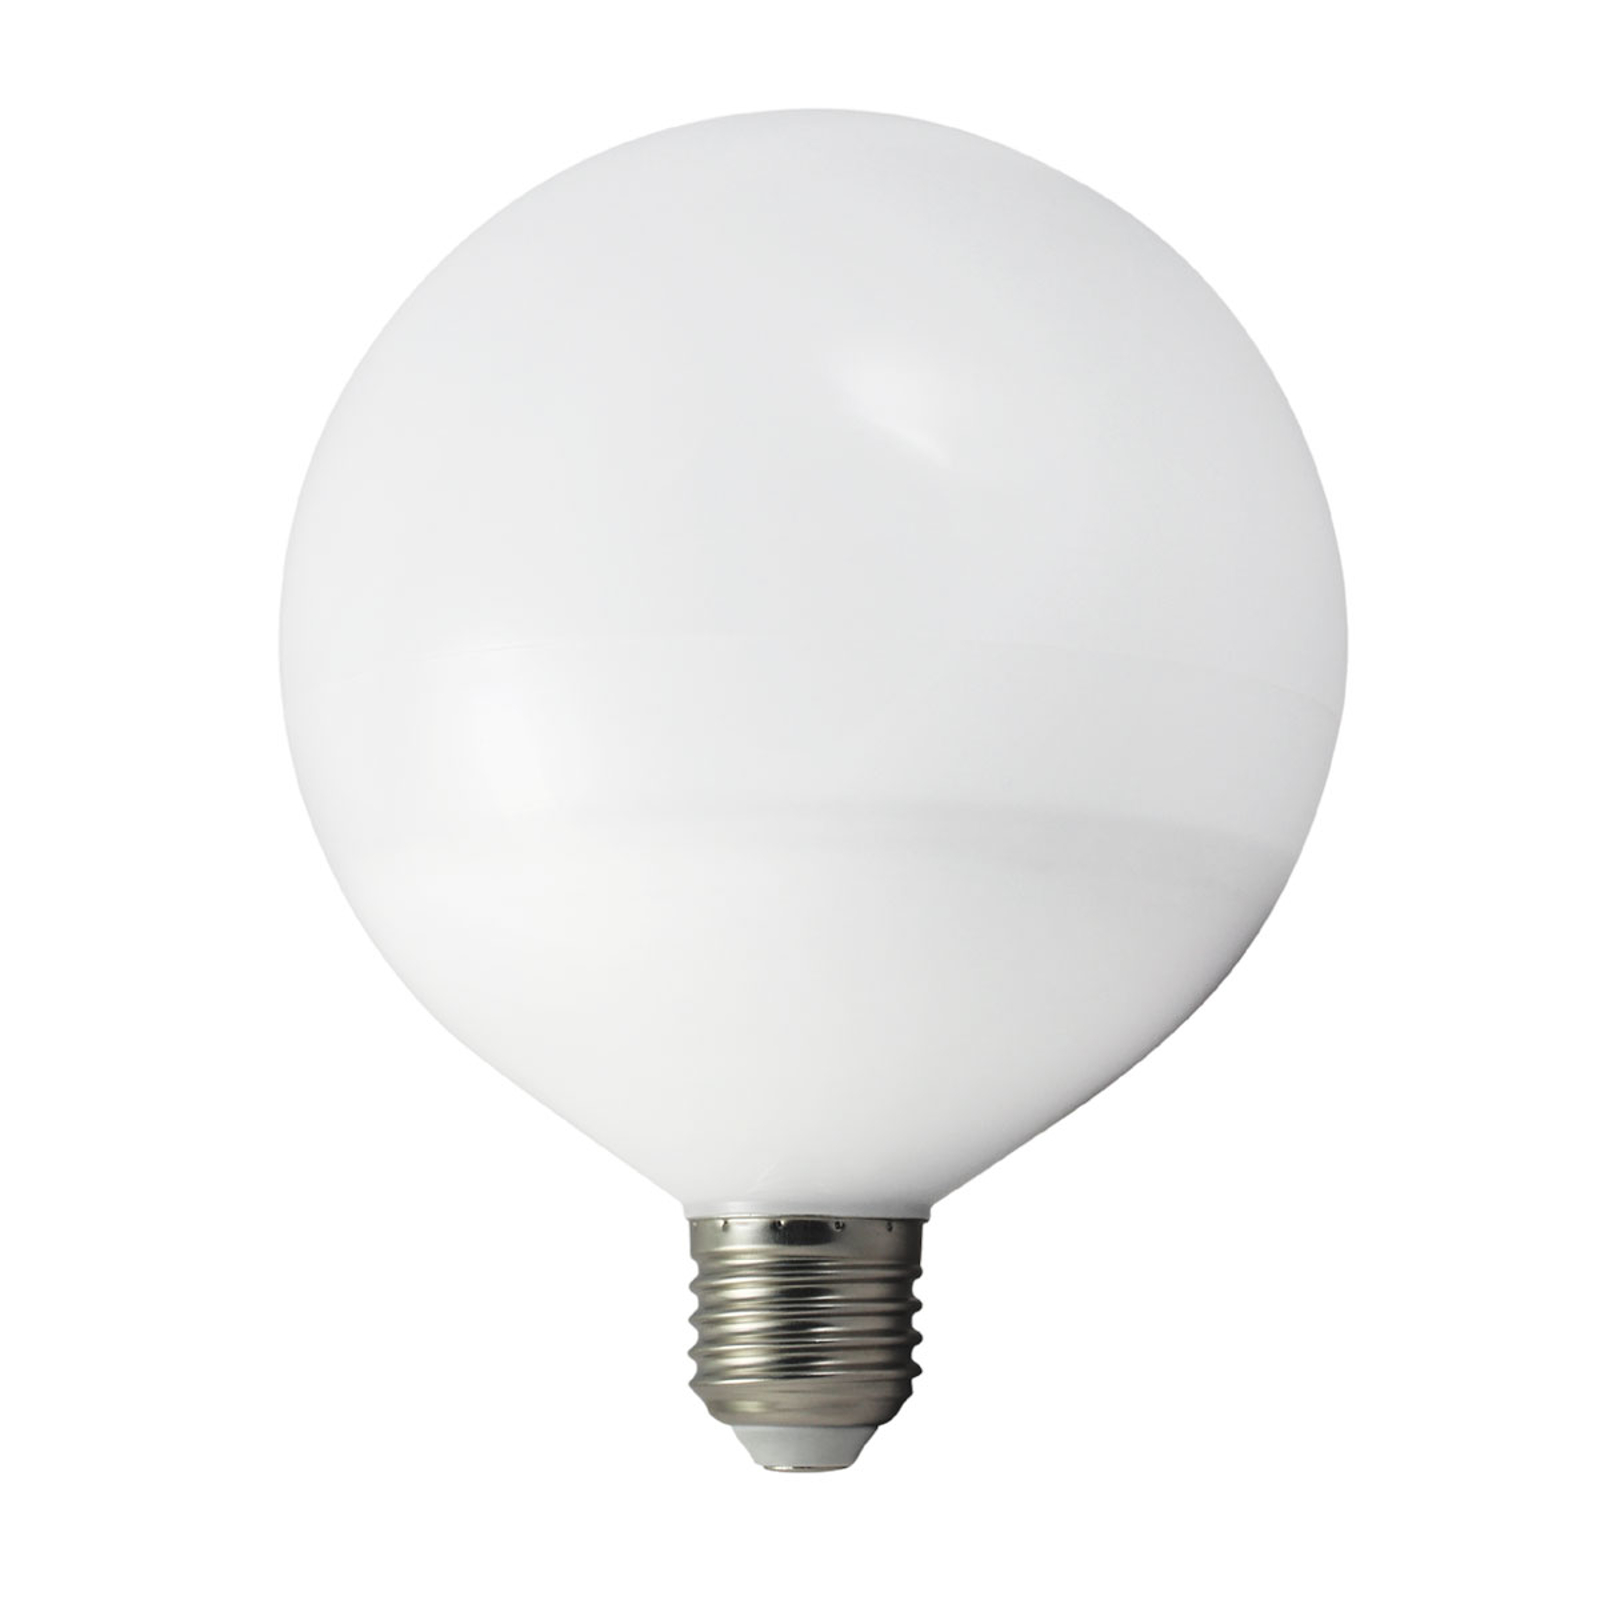 Bombilla tipo globo LED E27 15W 827, blanco cálido